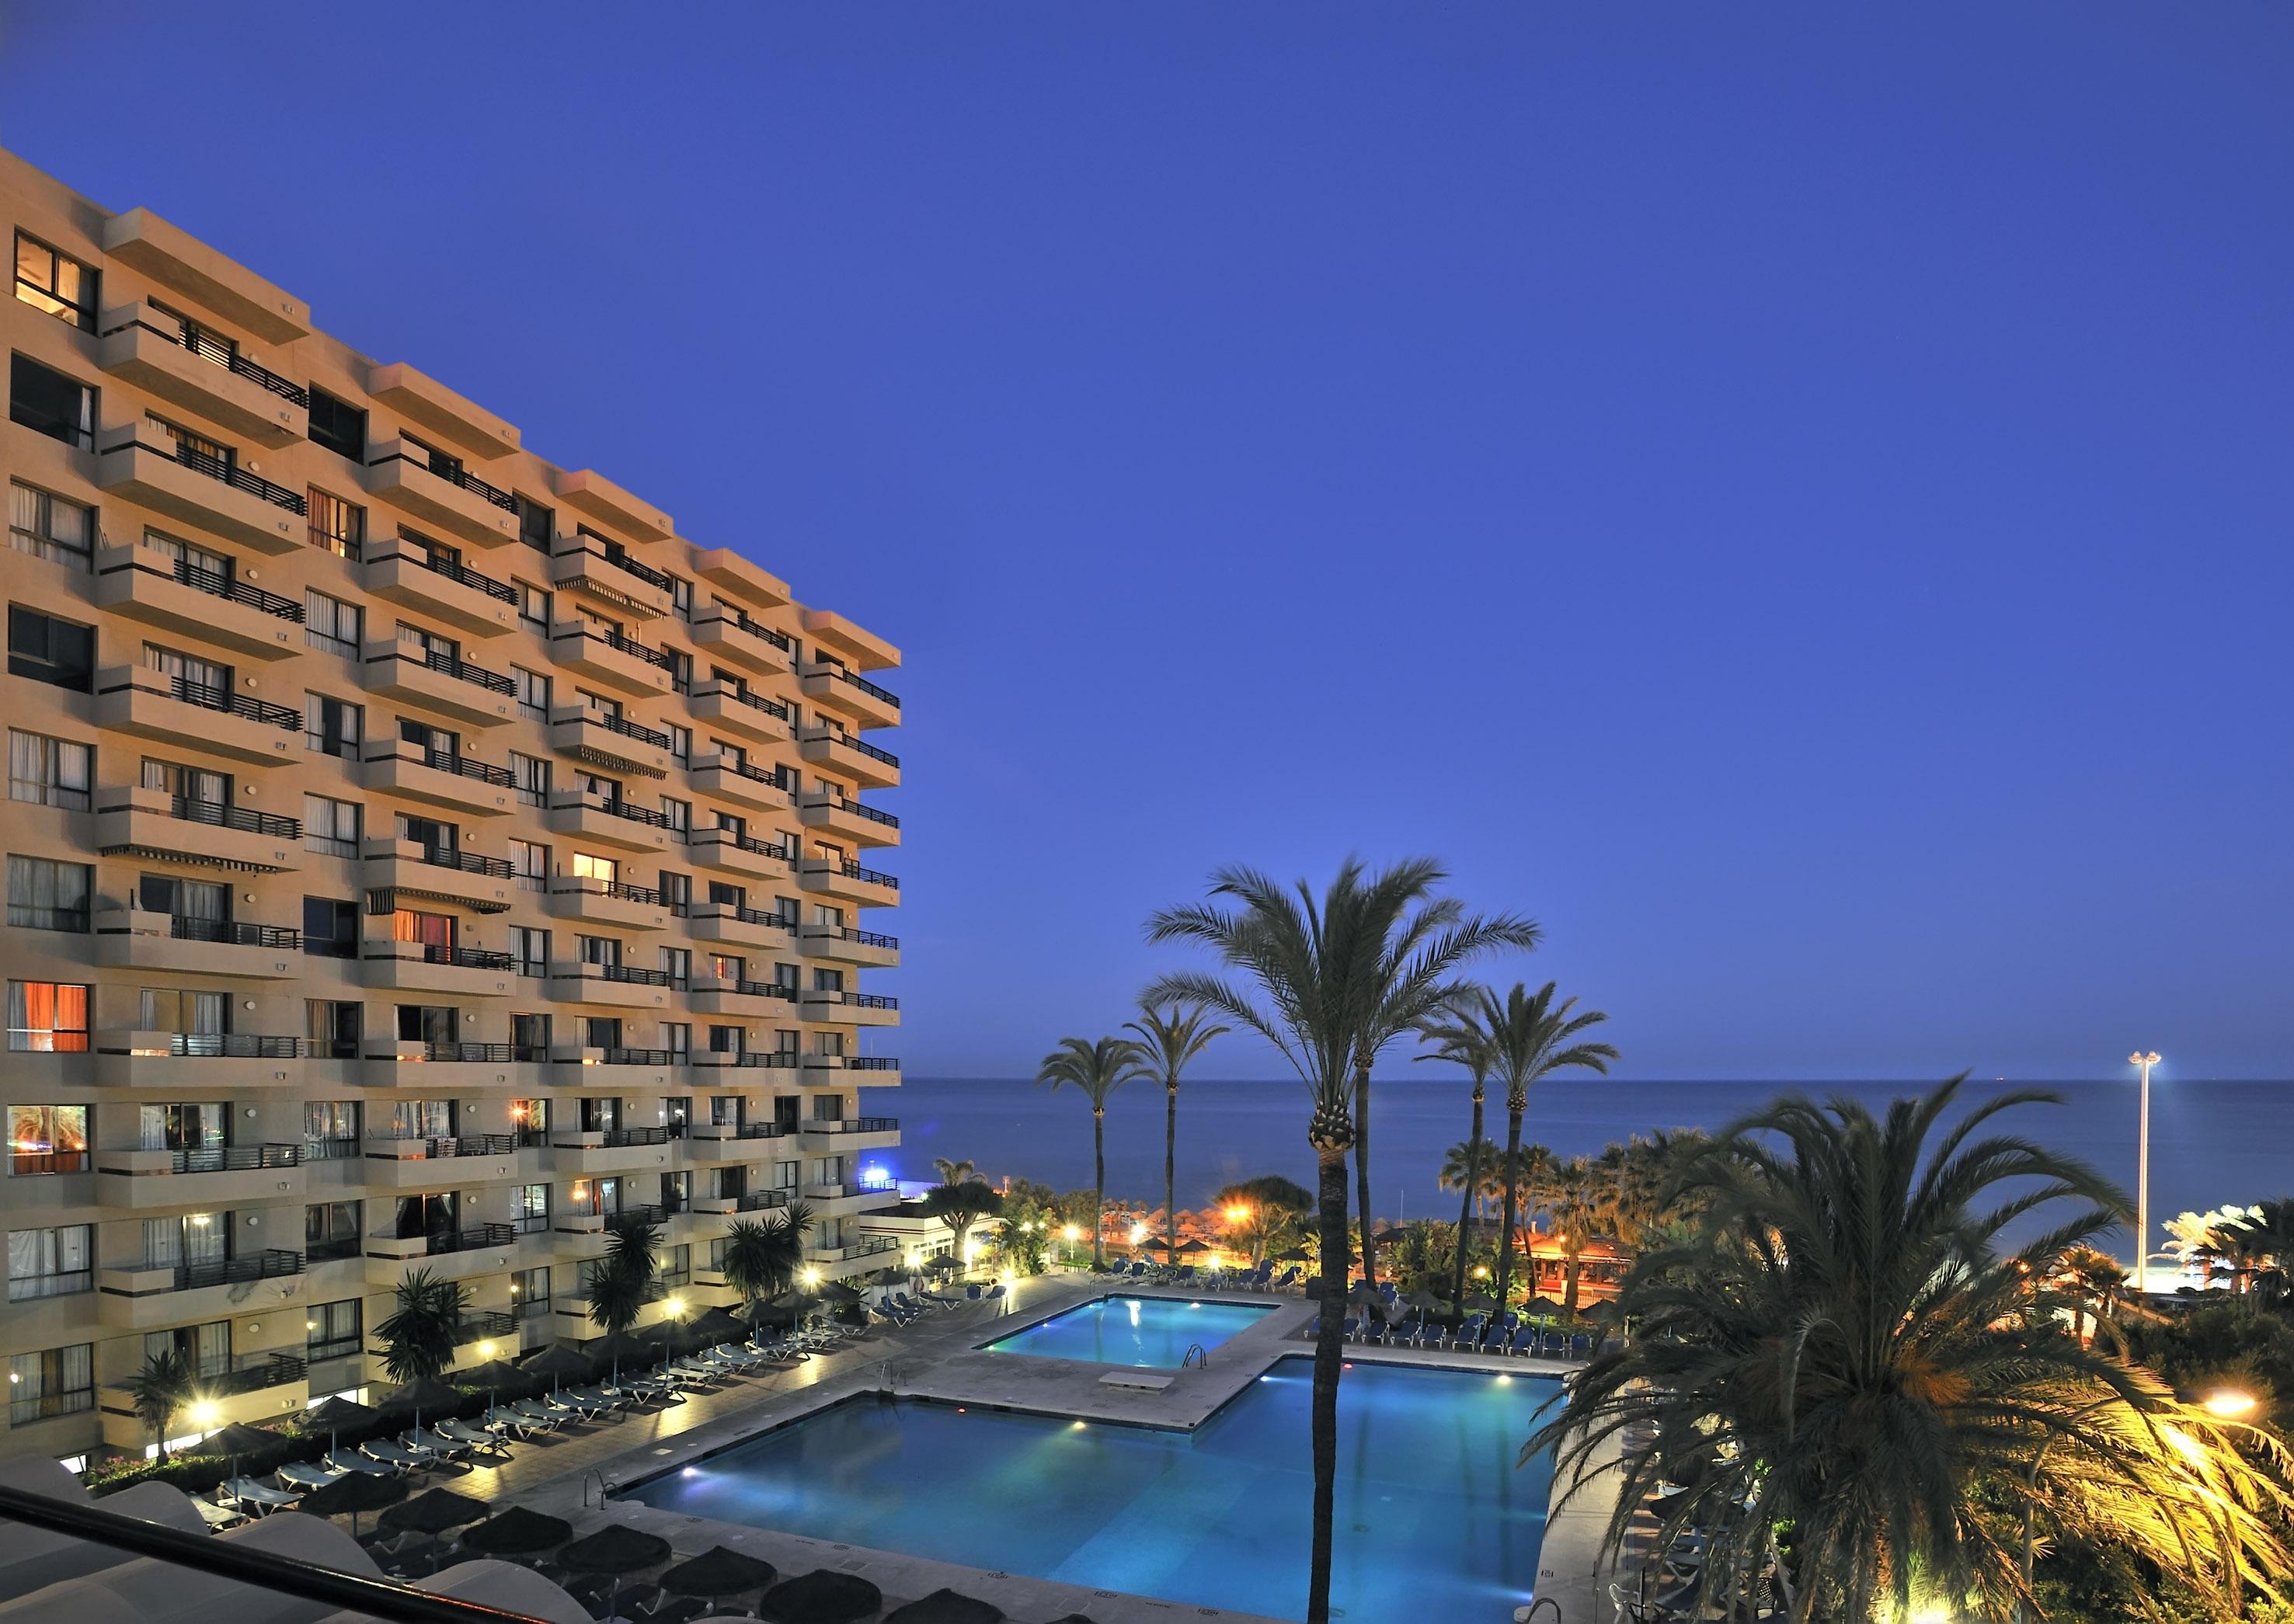 All Inclusive Sun Holidays to Sol House Costa Del Sol